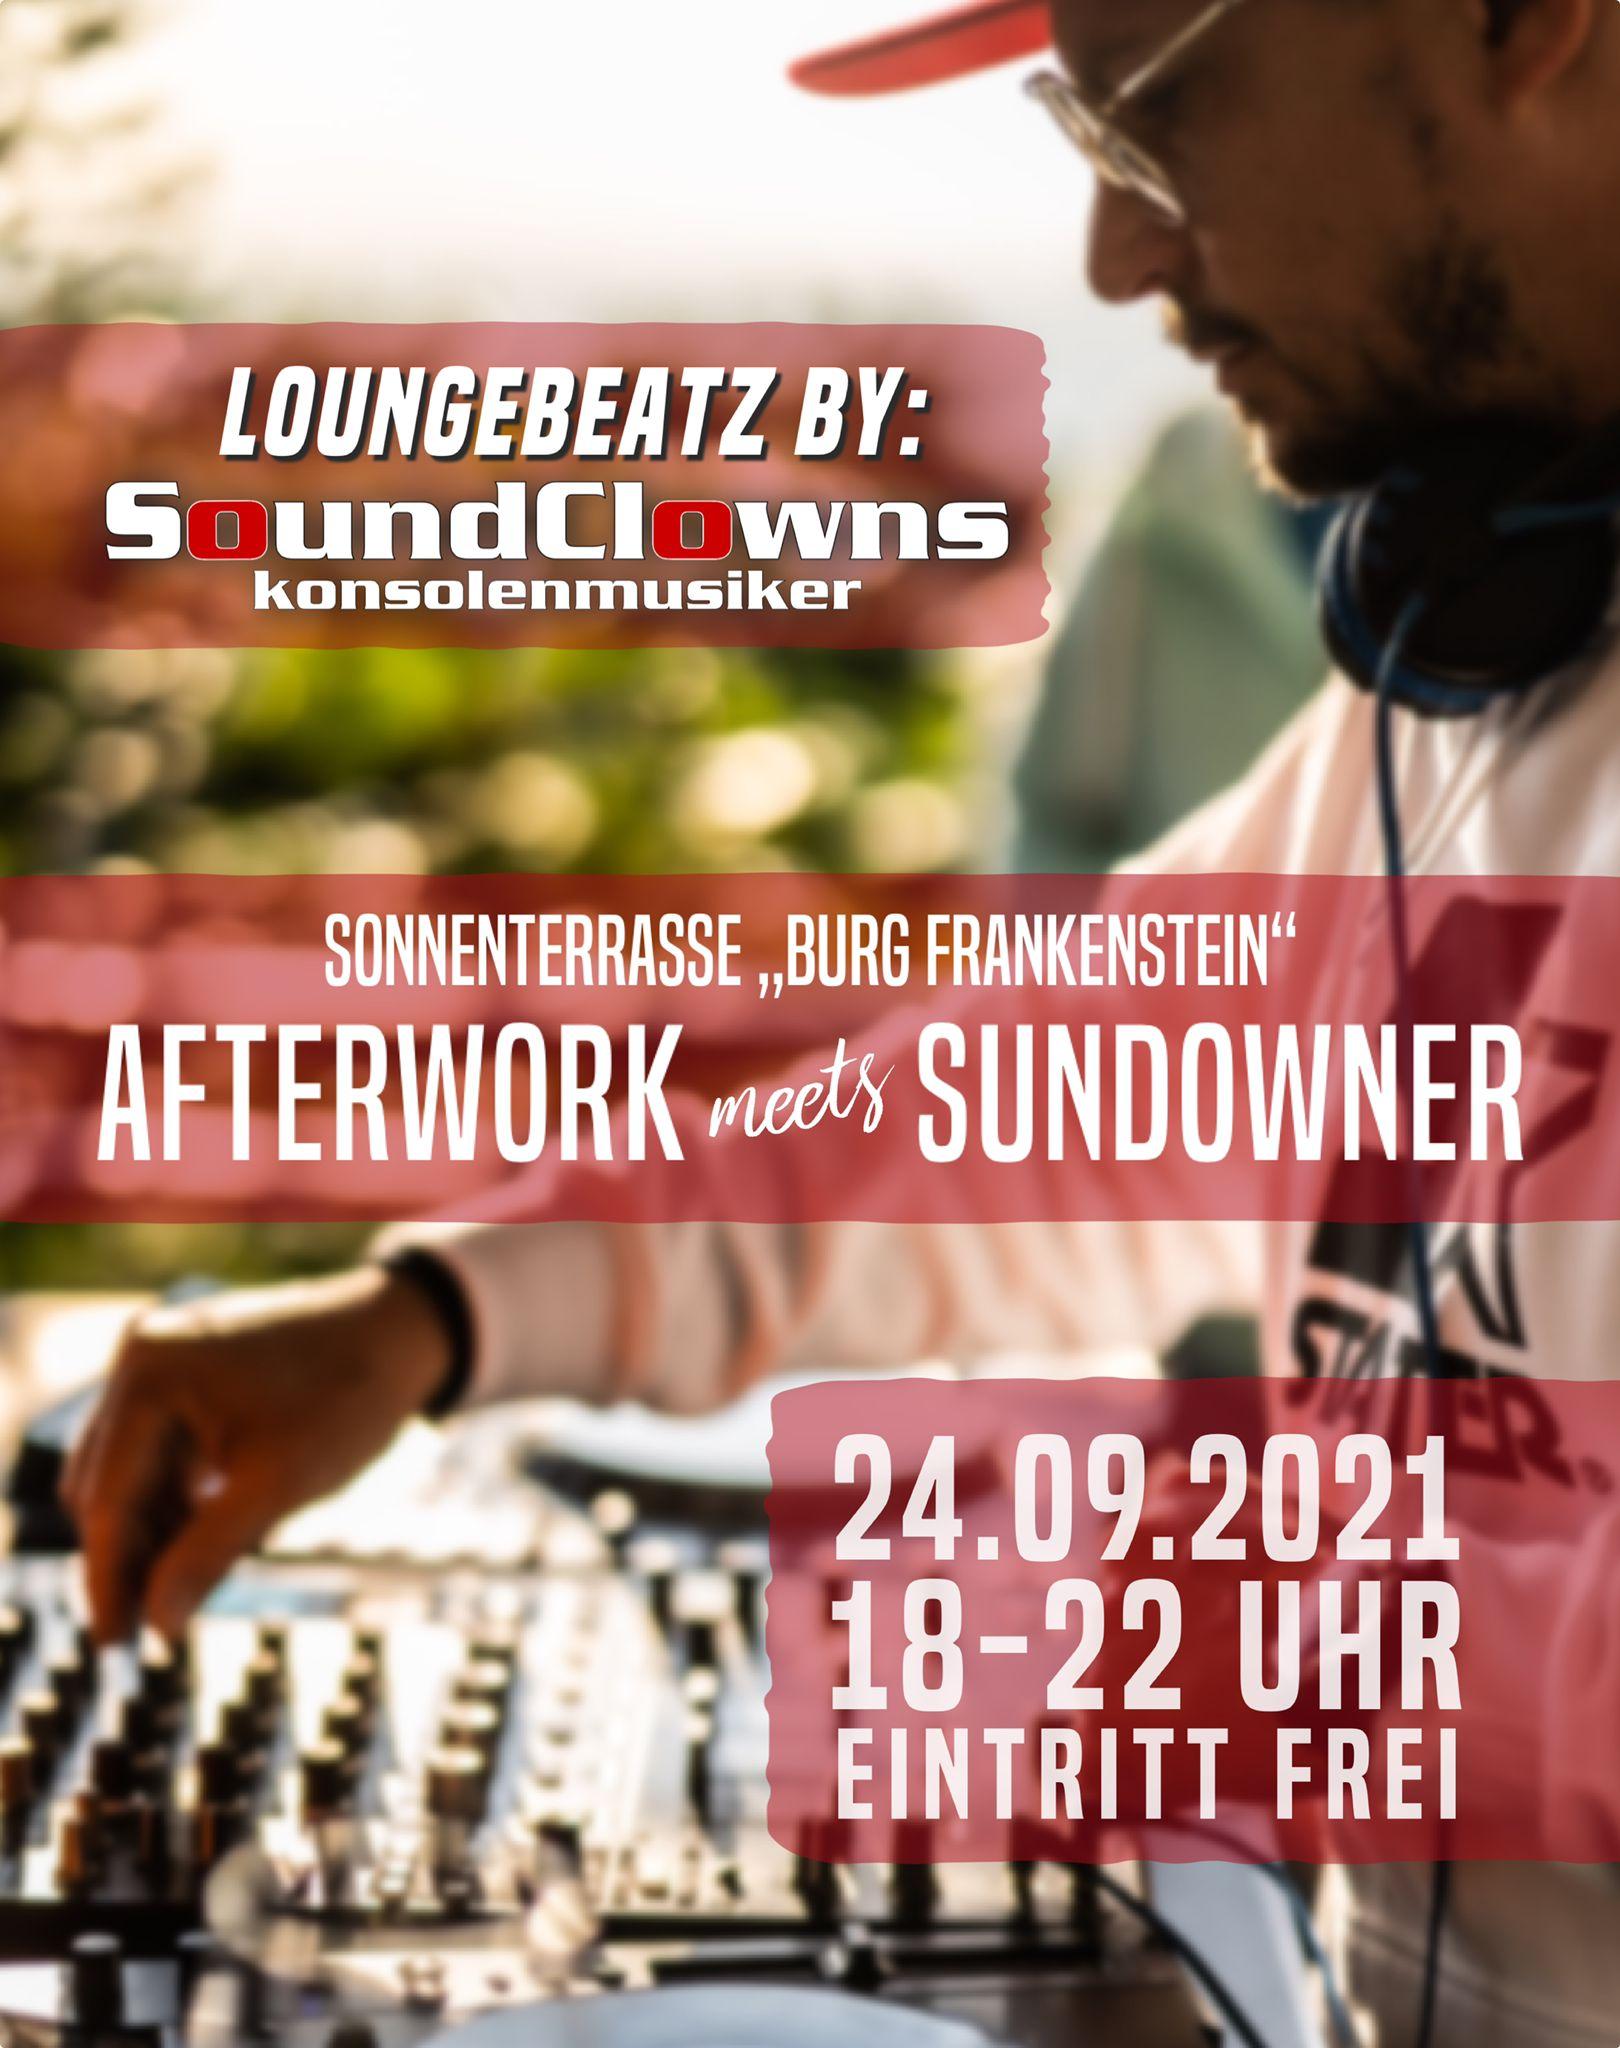 Sundowner 24.09.2021